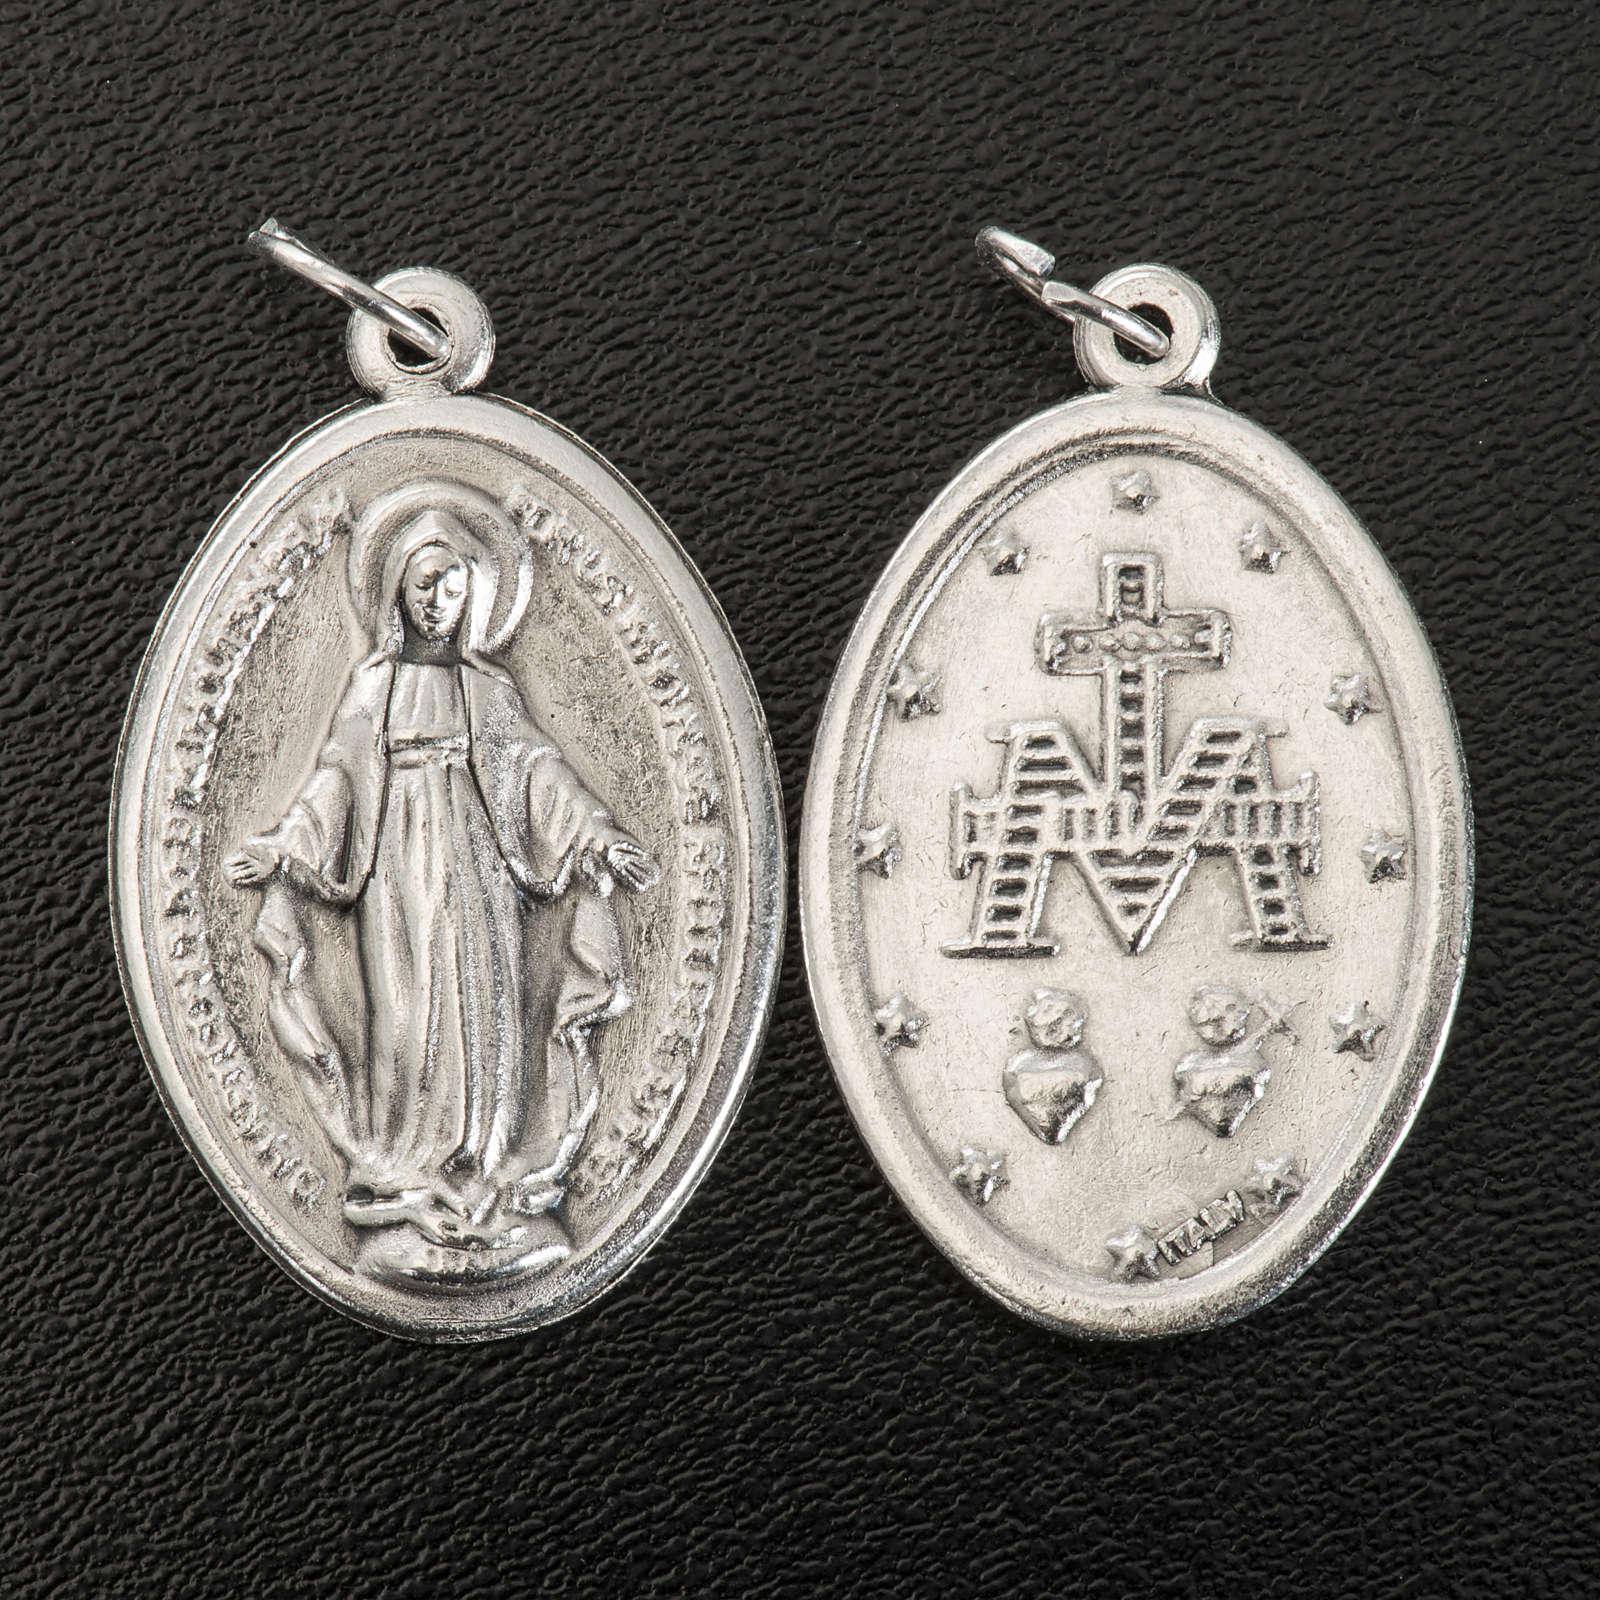 Medalla Milagrosa oval metal plateado 30mm 4